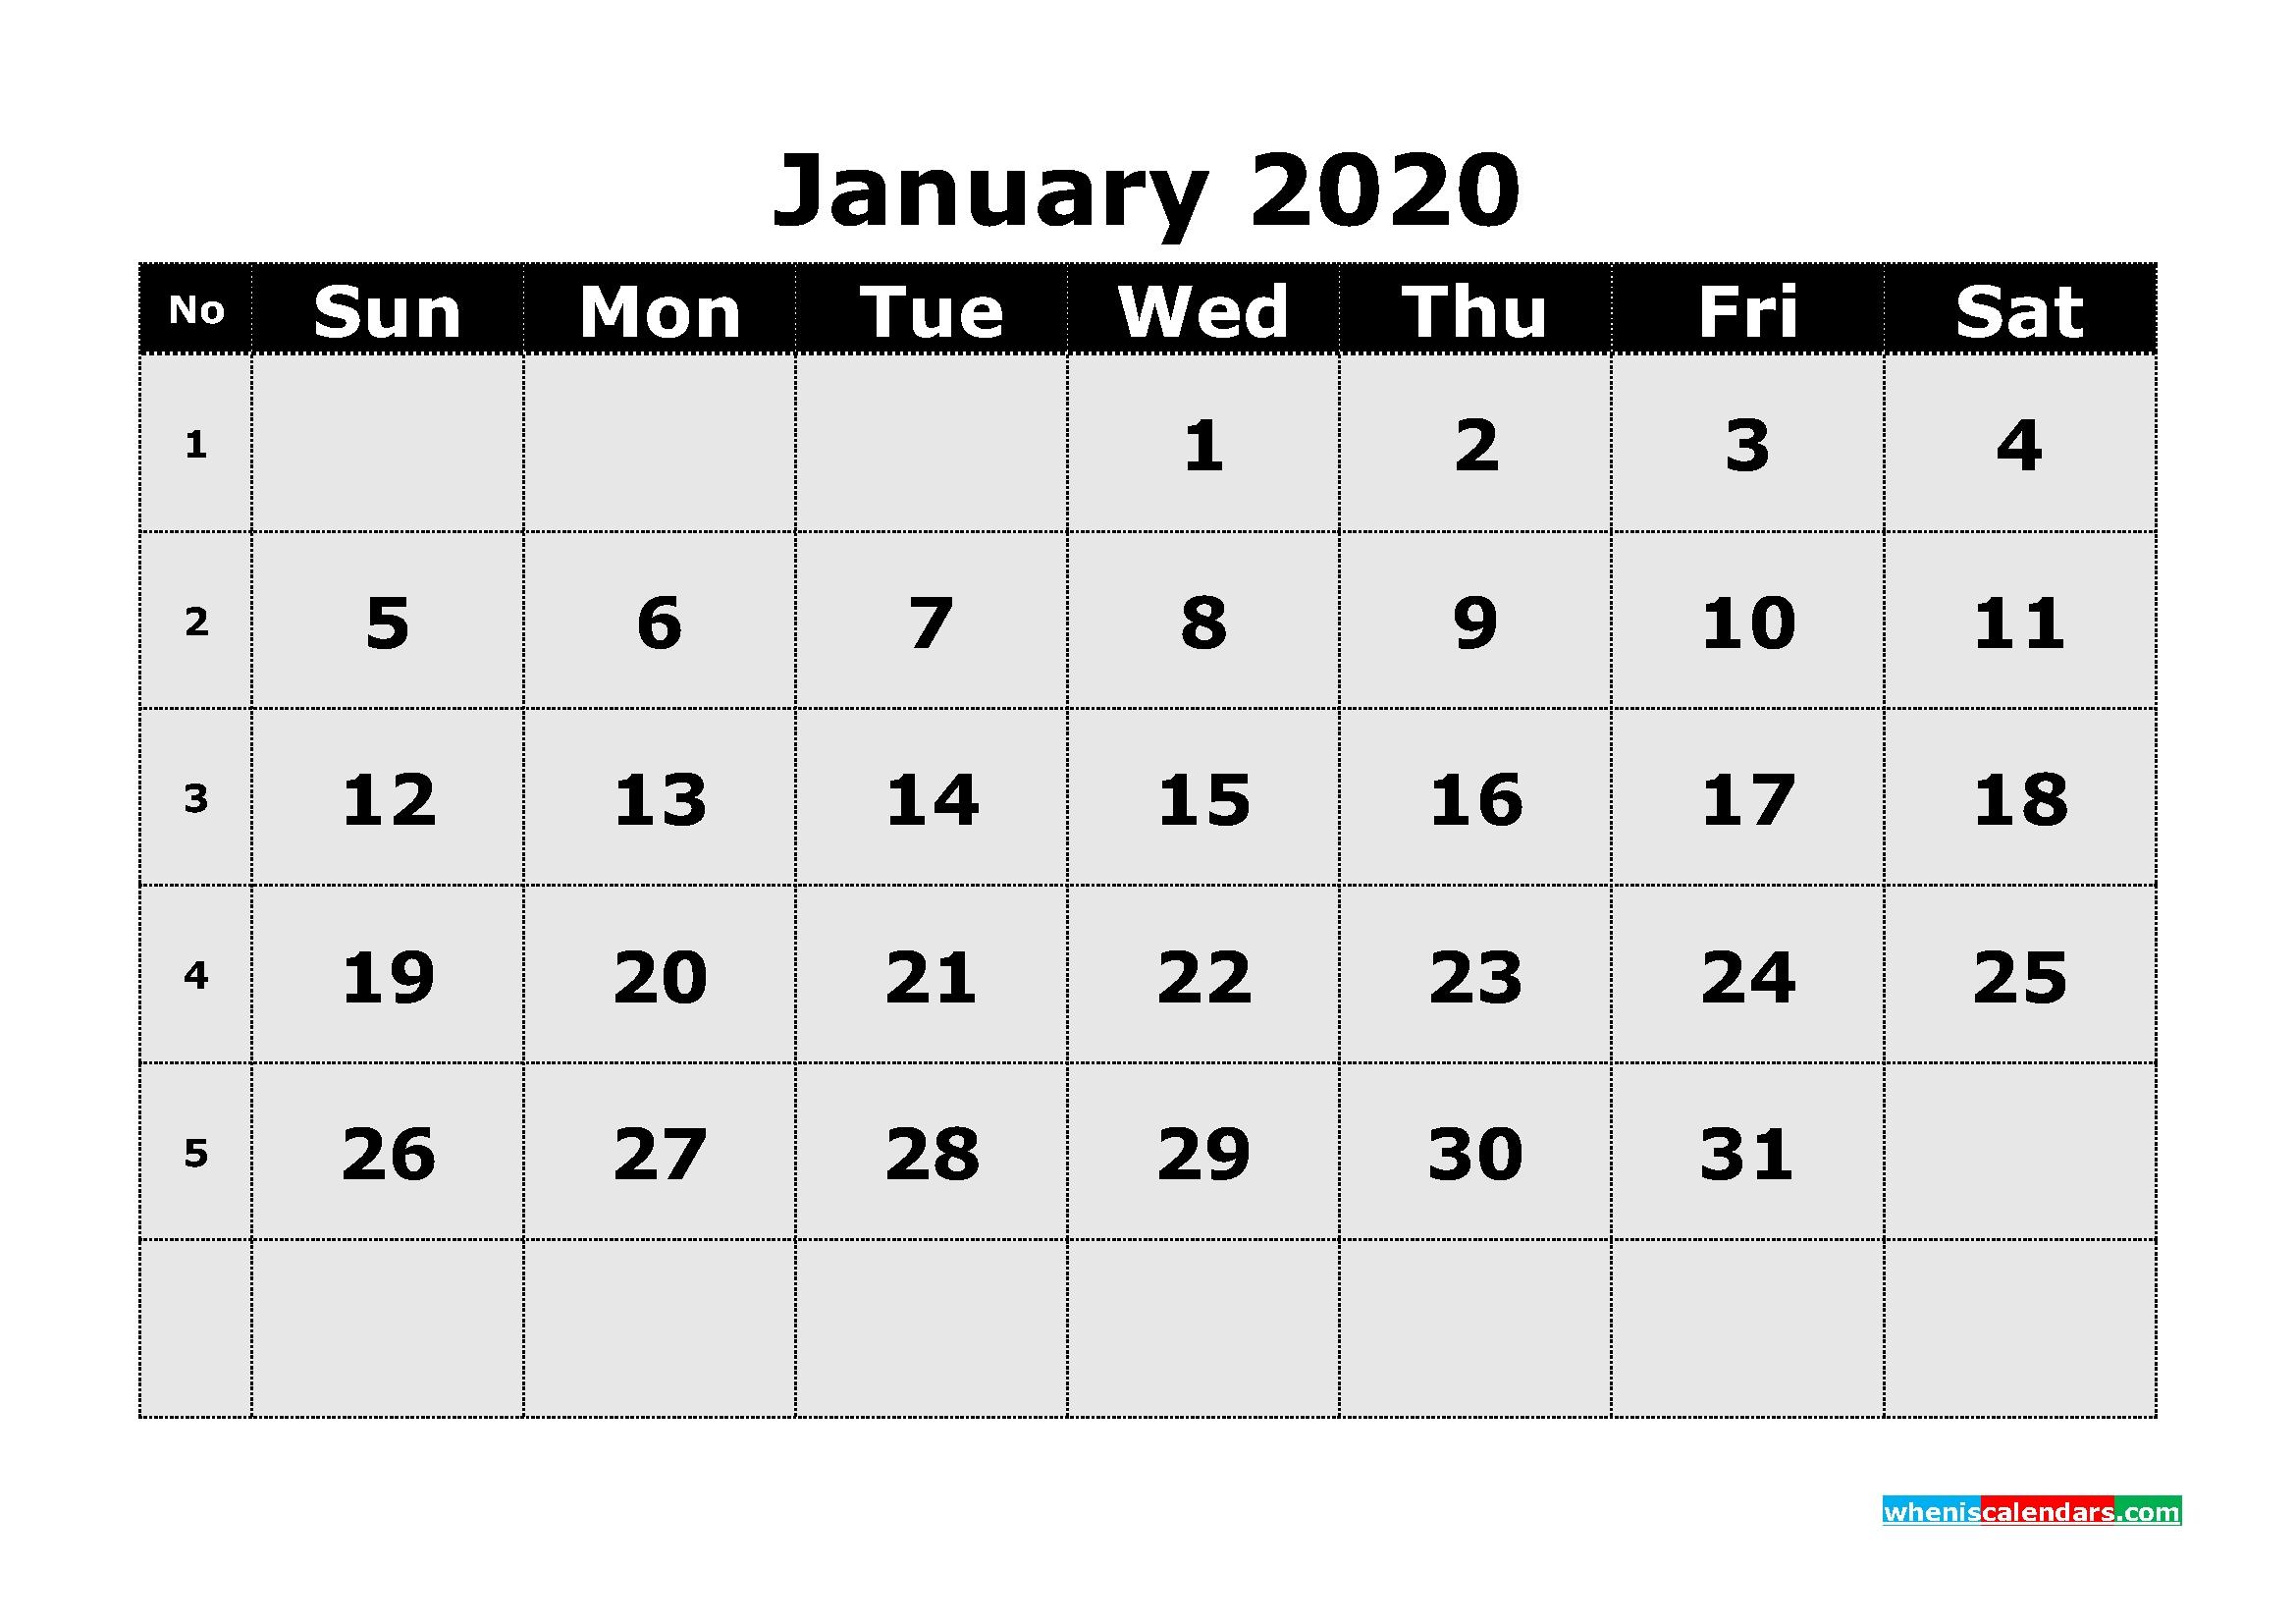 Free Printable January 2020 Calendar Template Word | Free-Microsoft Word Template 2020 Calendar